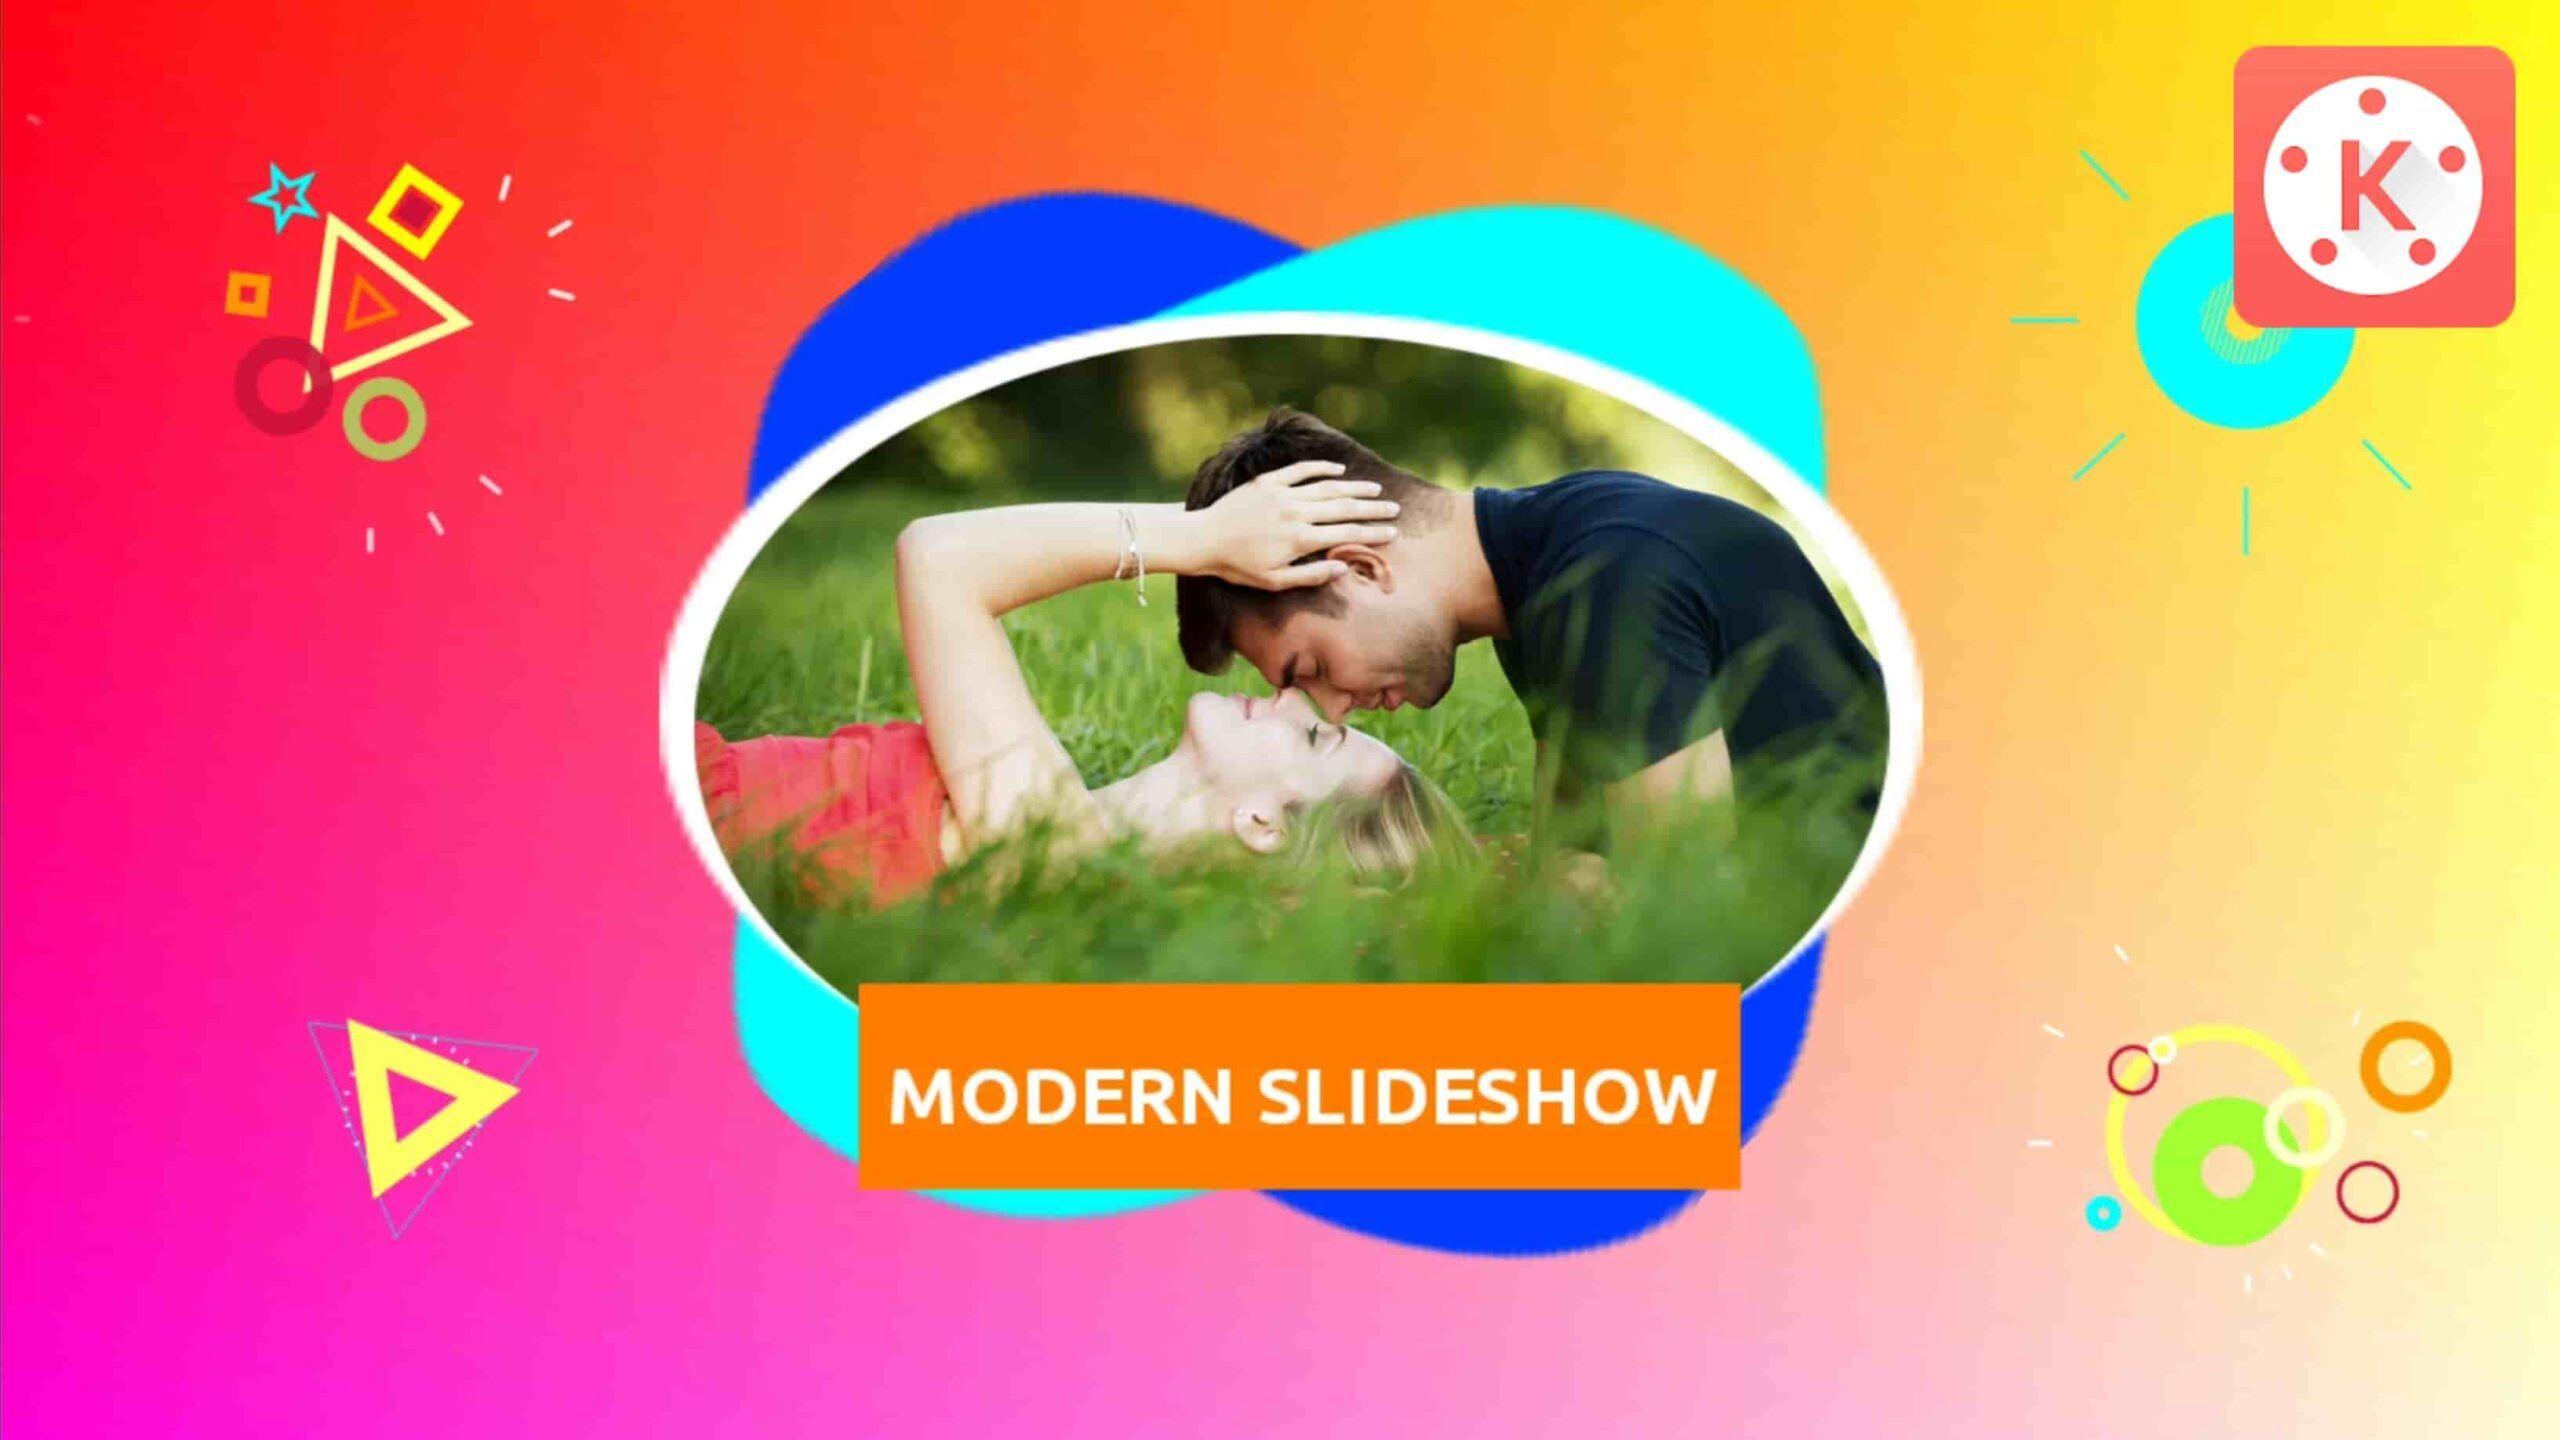 Free Photo Slideshow Template In Kinemaster 2020 Photo Slideshow Free Photos Text Animation